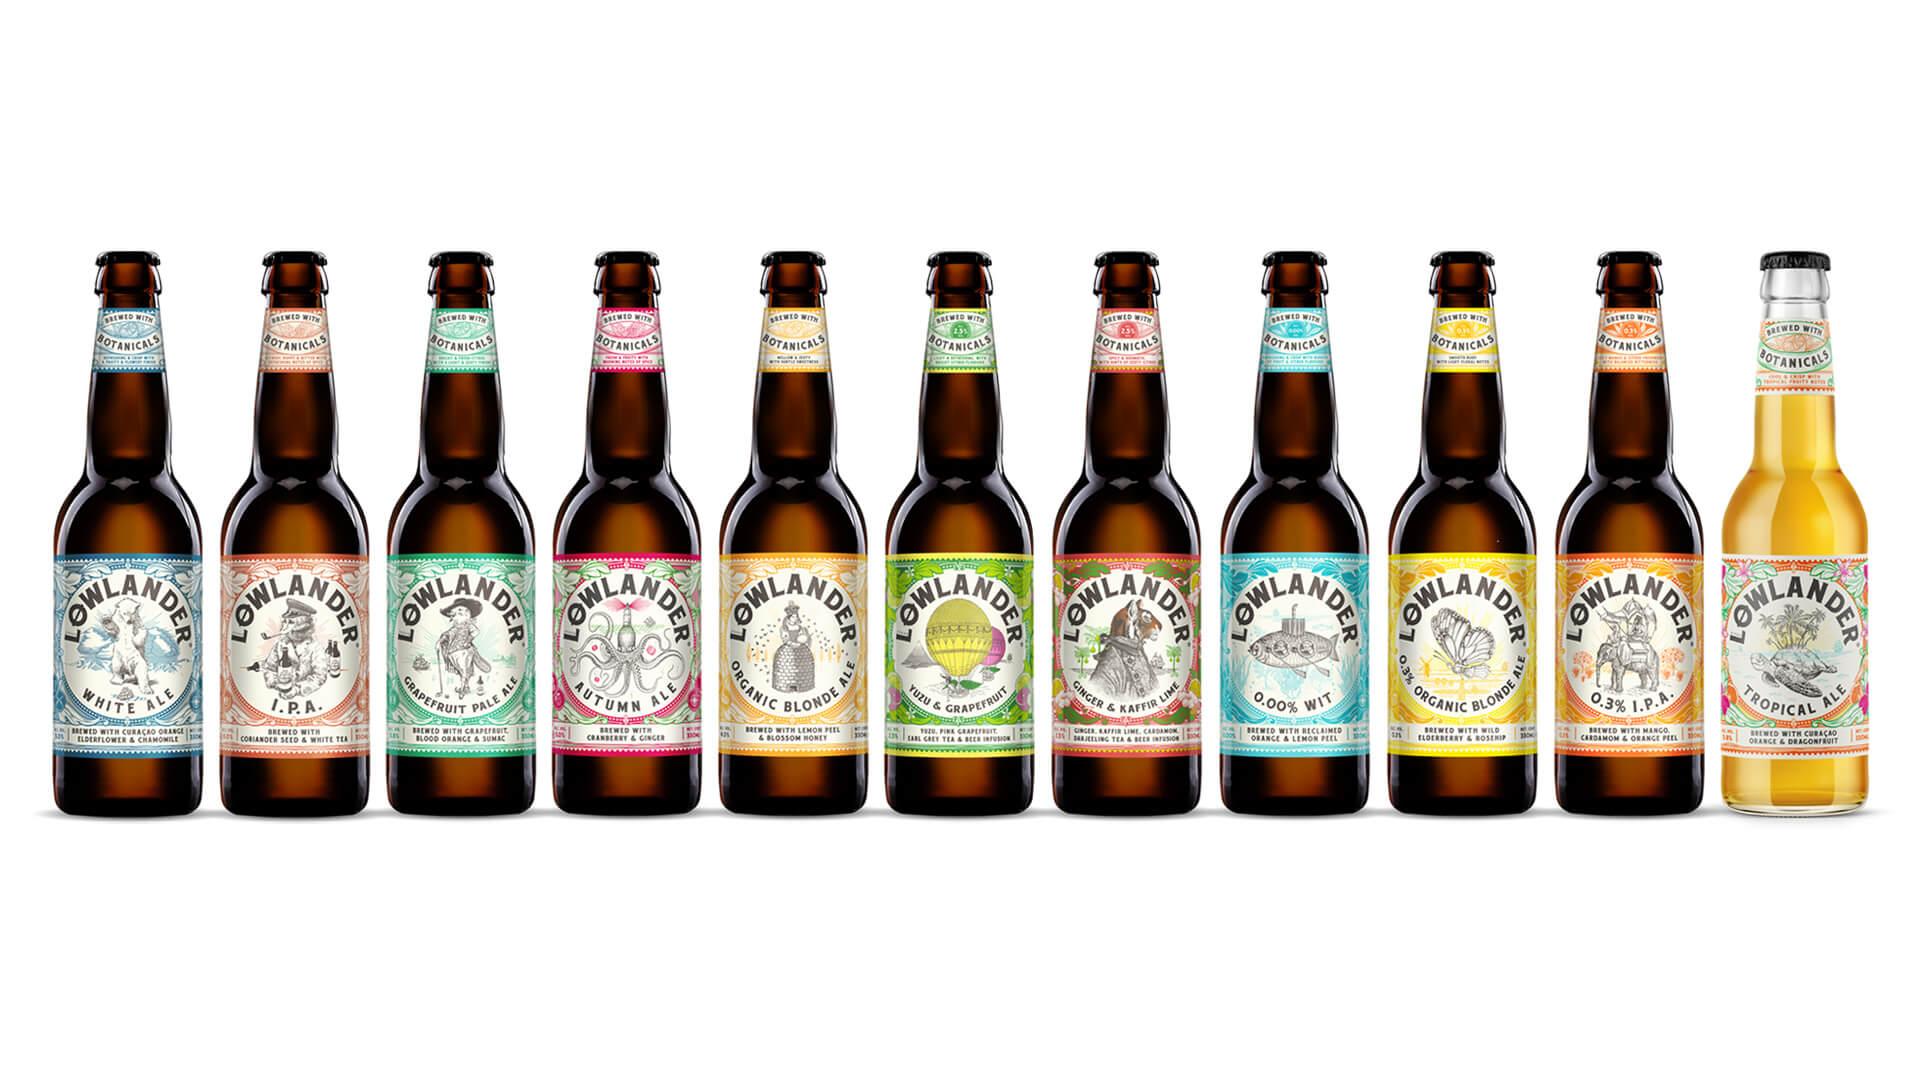 Lowlander Beer bottle label design by Mutiny Agency